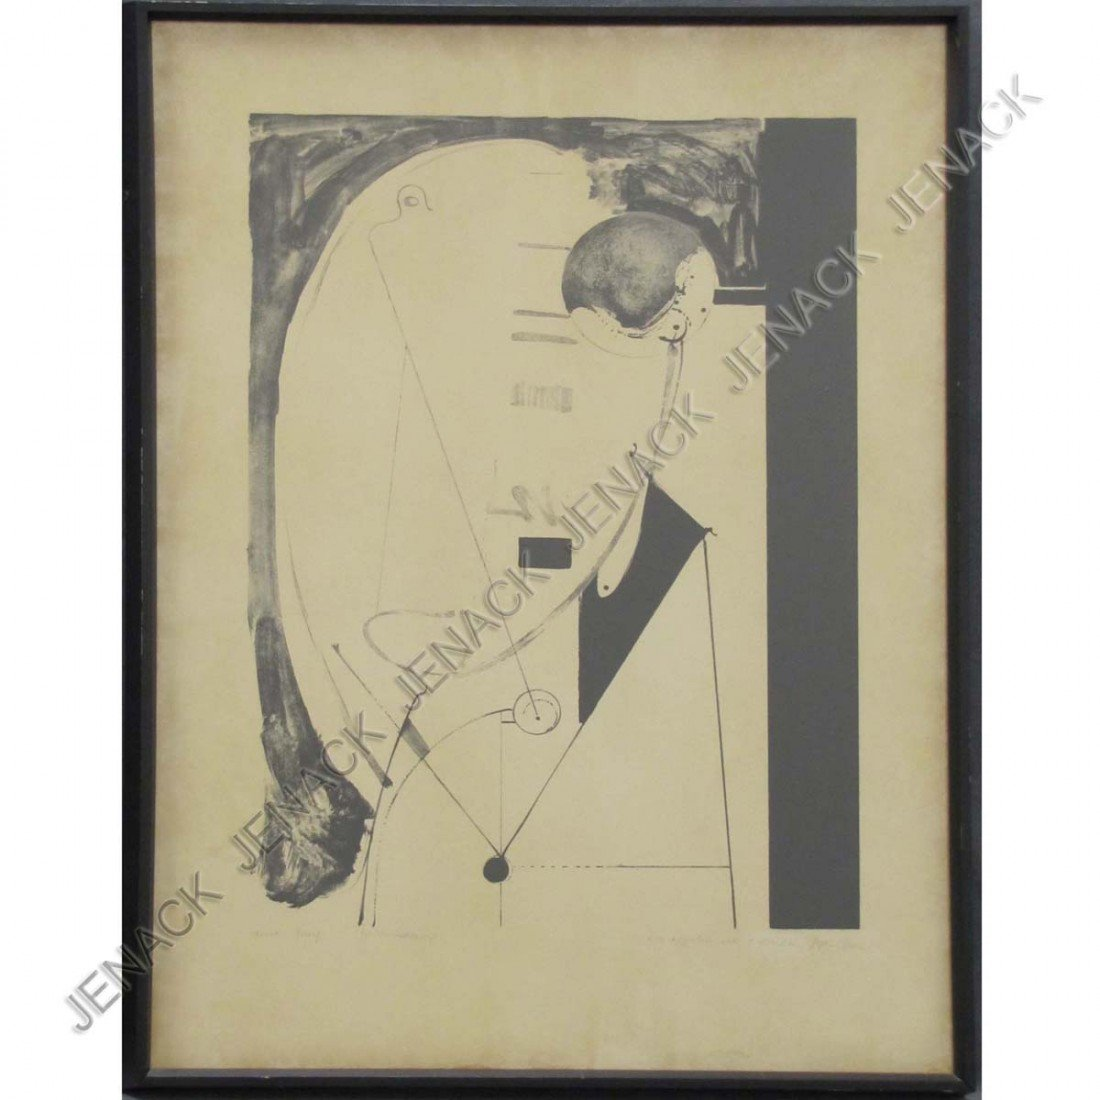 51: STEPHEN GREENE (AMERICAN 1917-1999), LITHOGRAPH